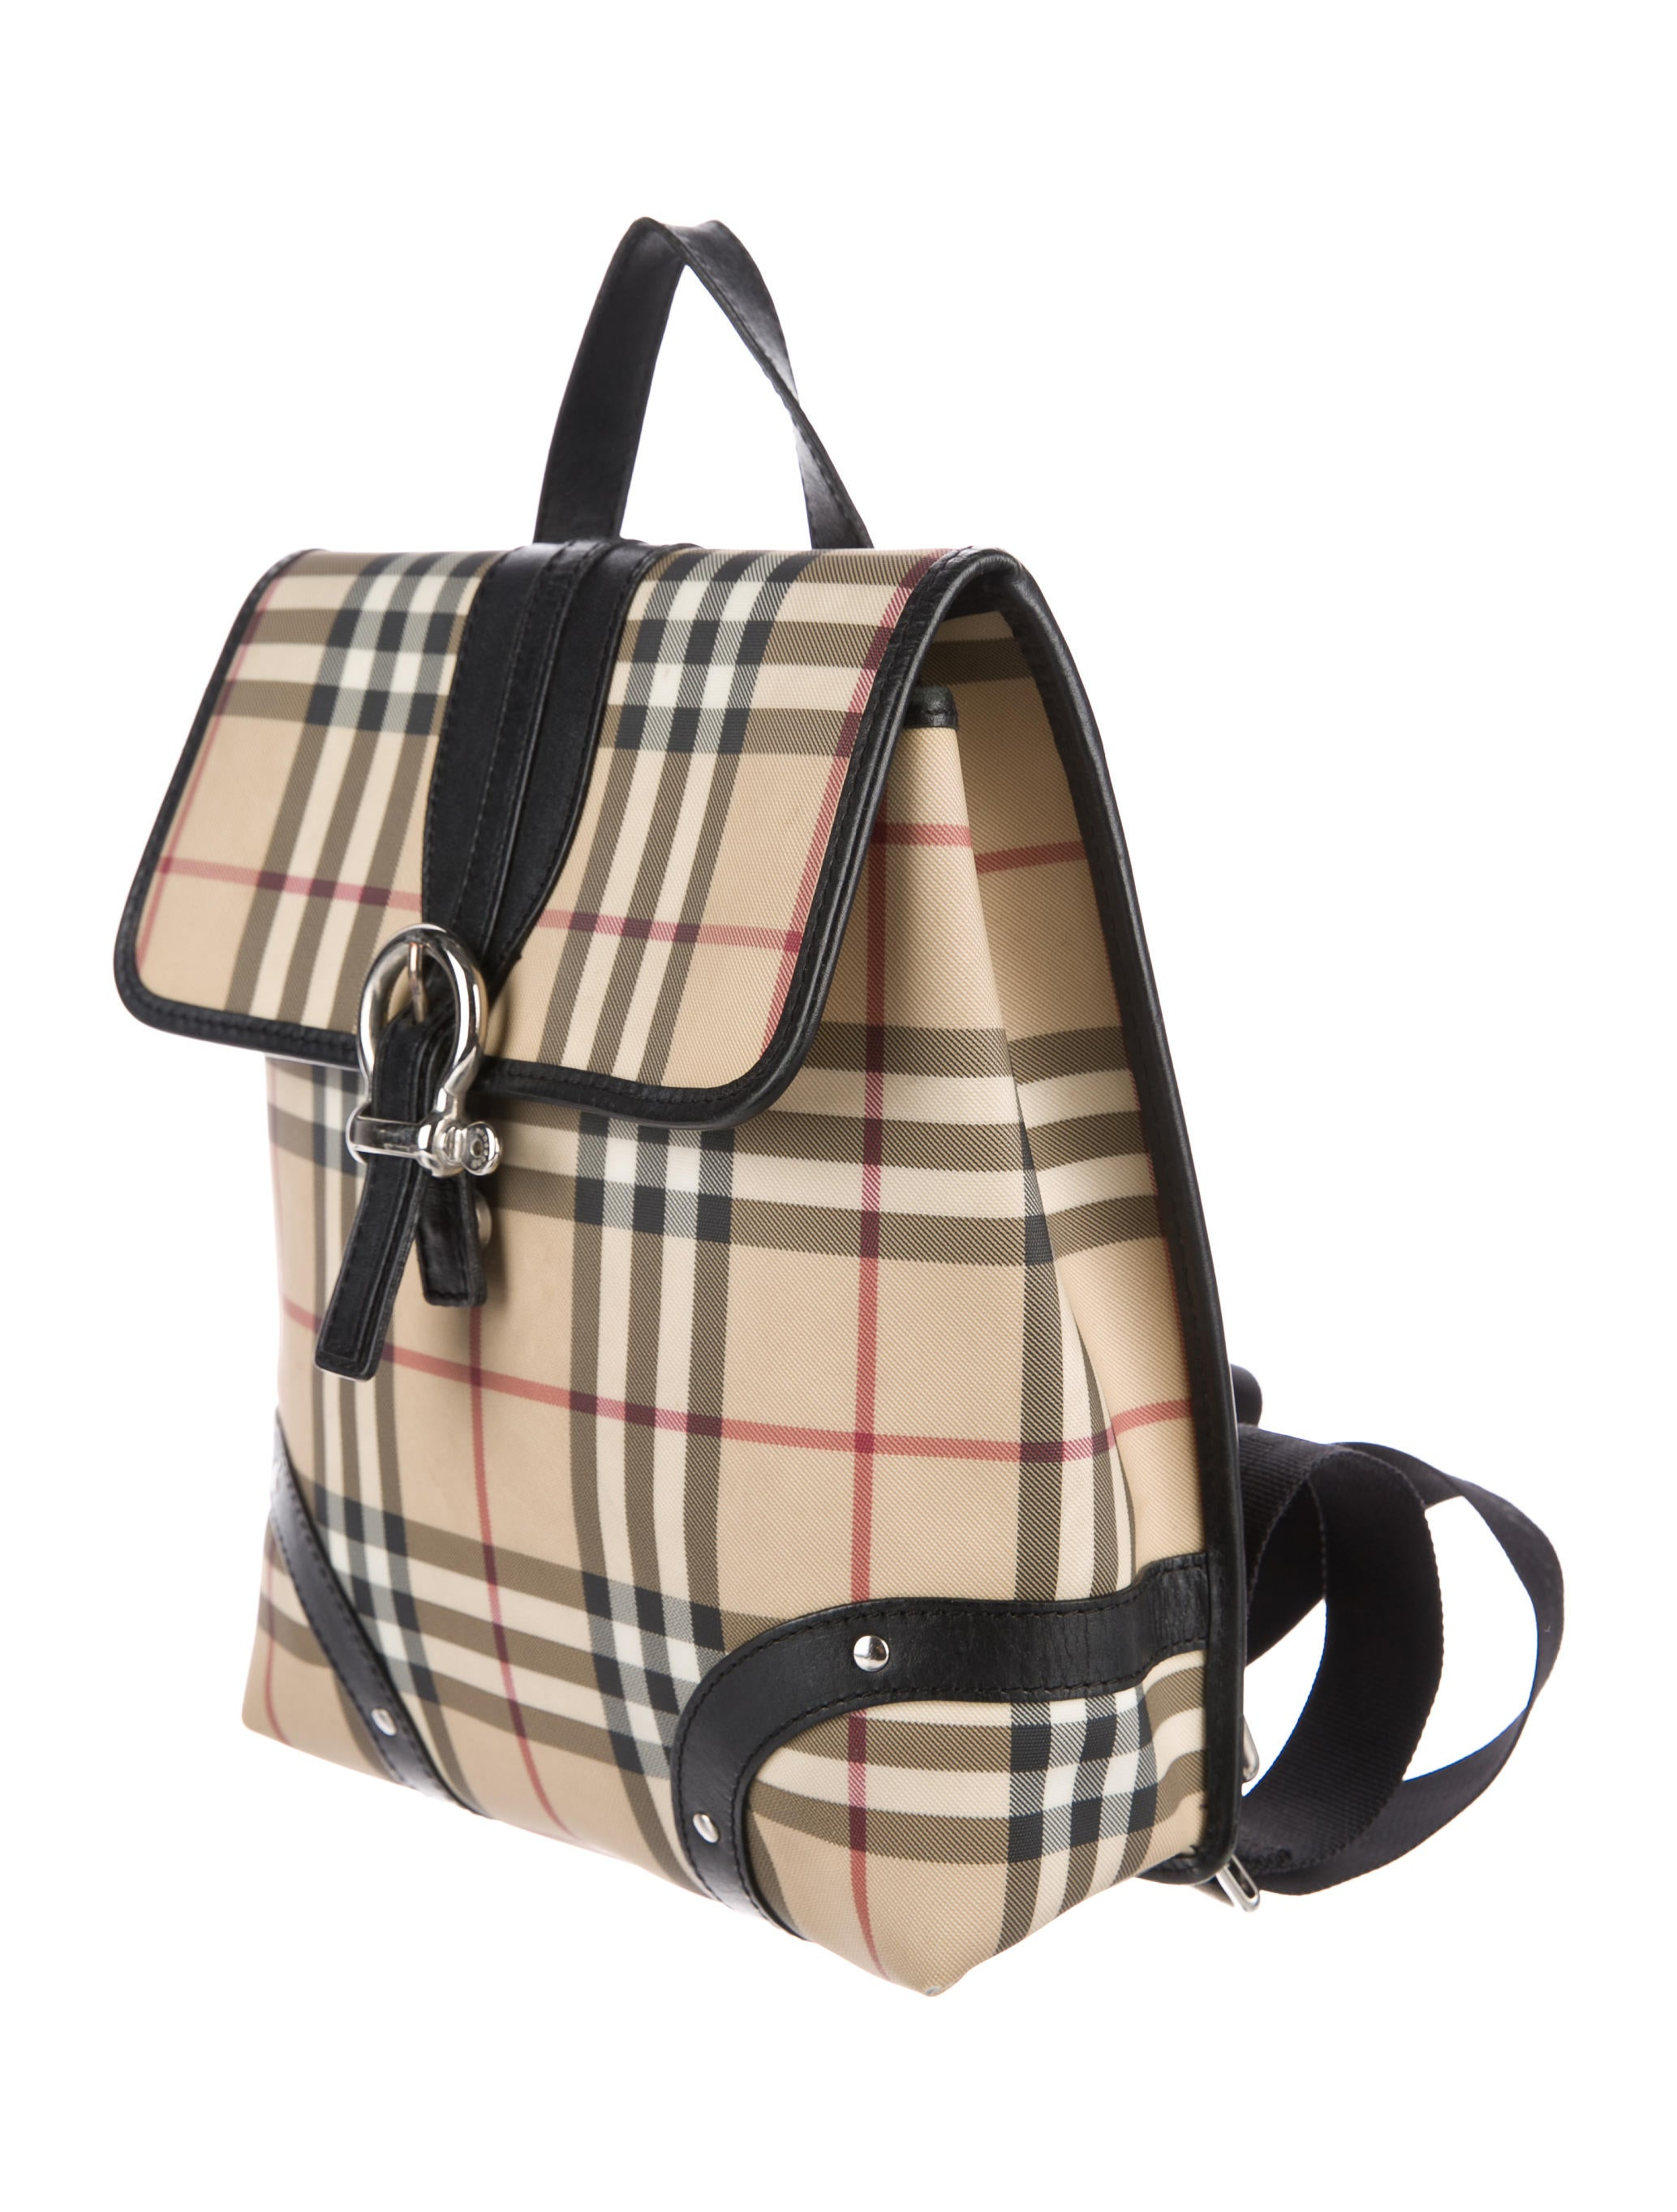 Burberry Nova Check Backpack - Handbags - BUR79674 | The ...